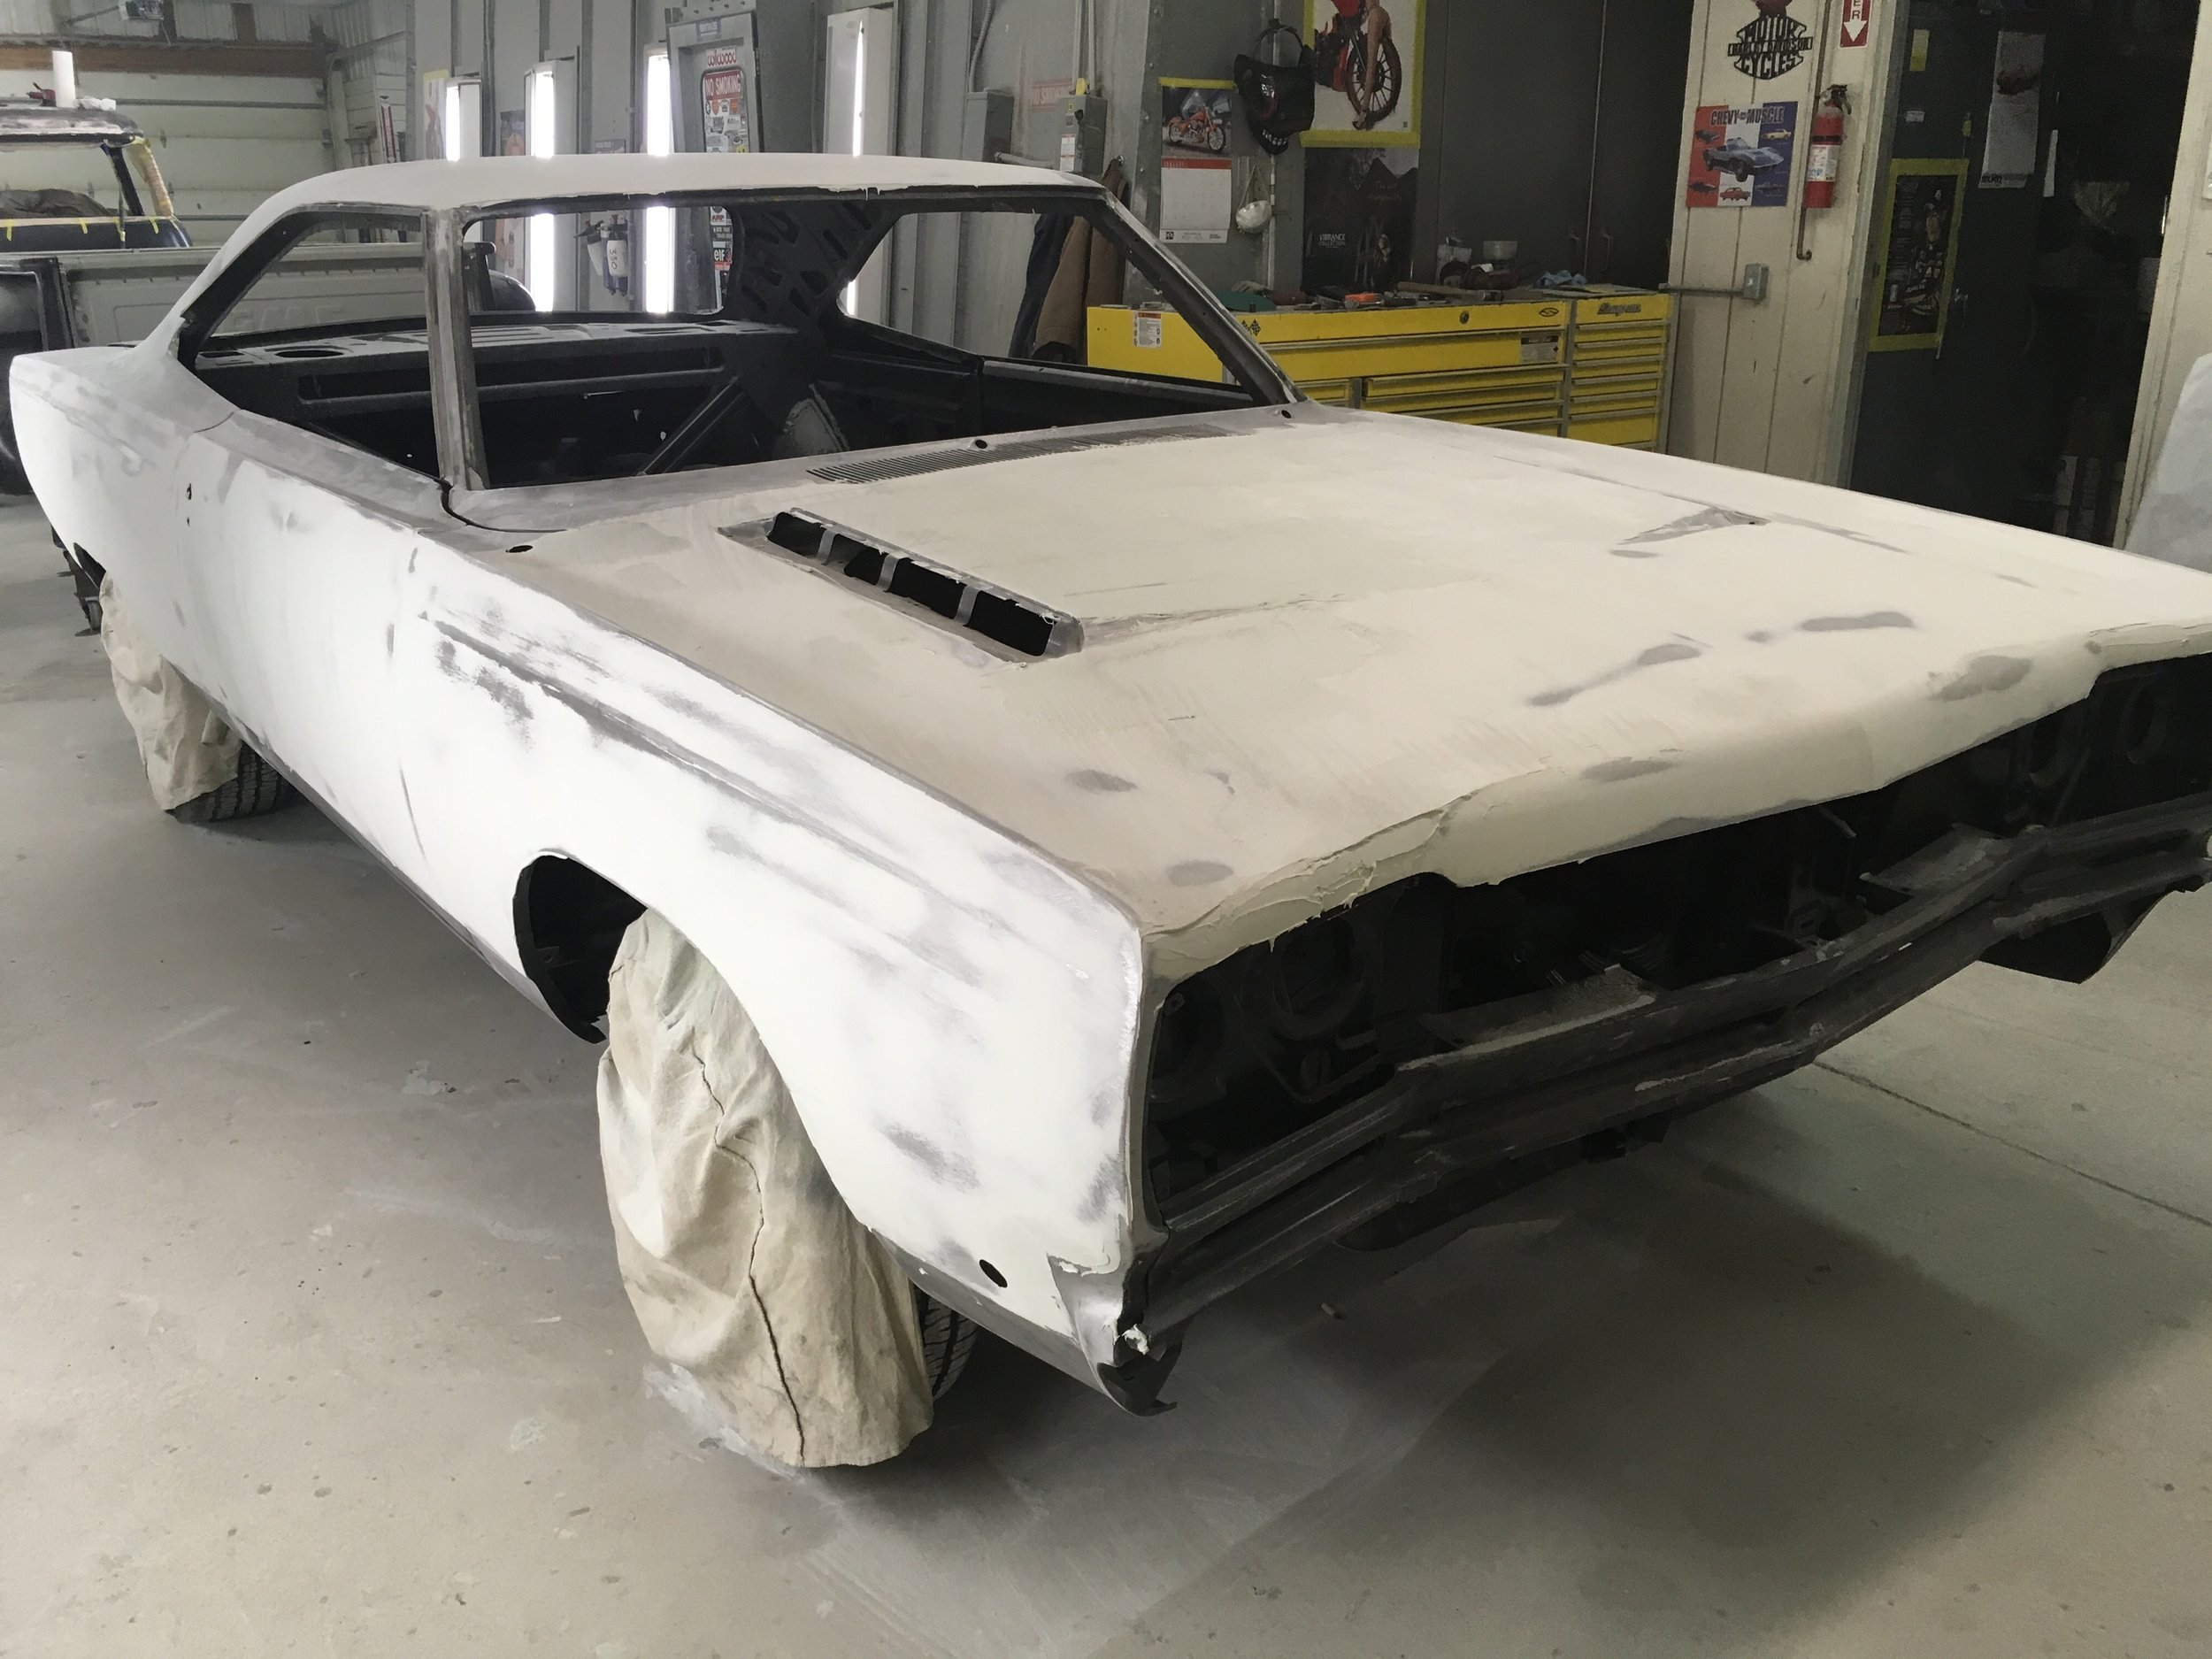 1968-Plymouth-GTX-minneapolis-custom-built-hot-rod-restoration-body-work.jpg